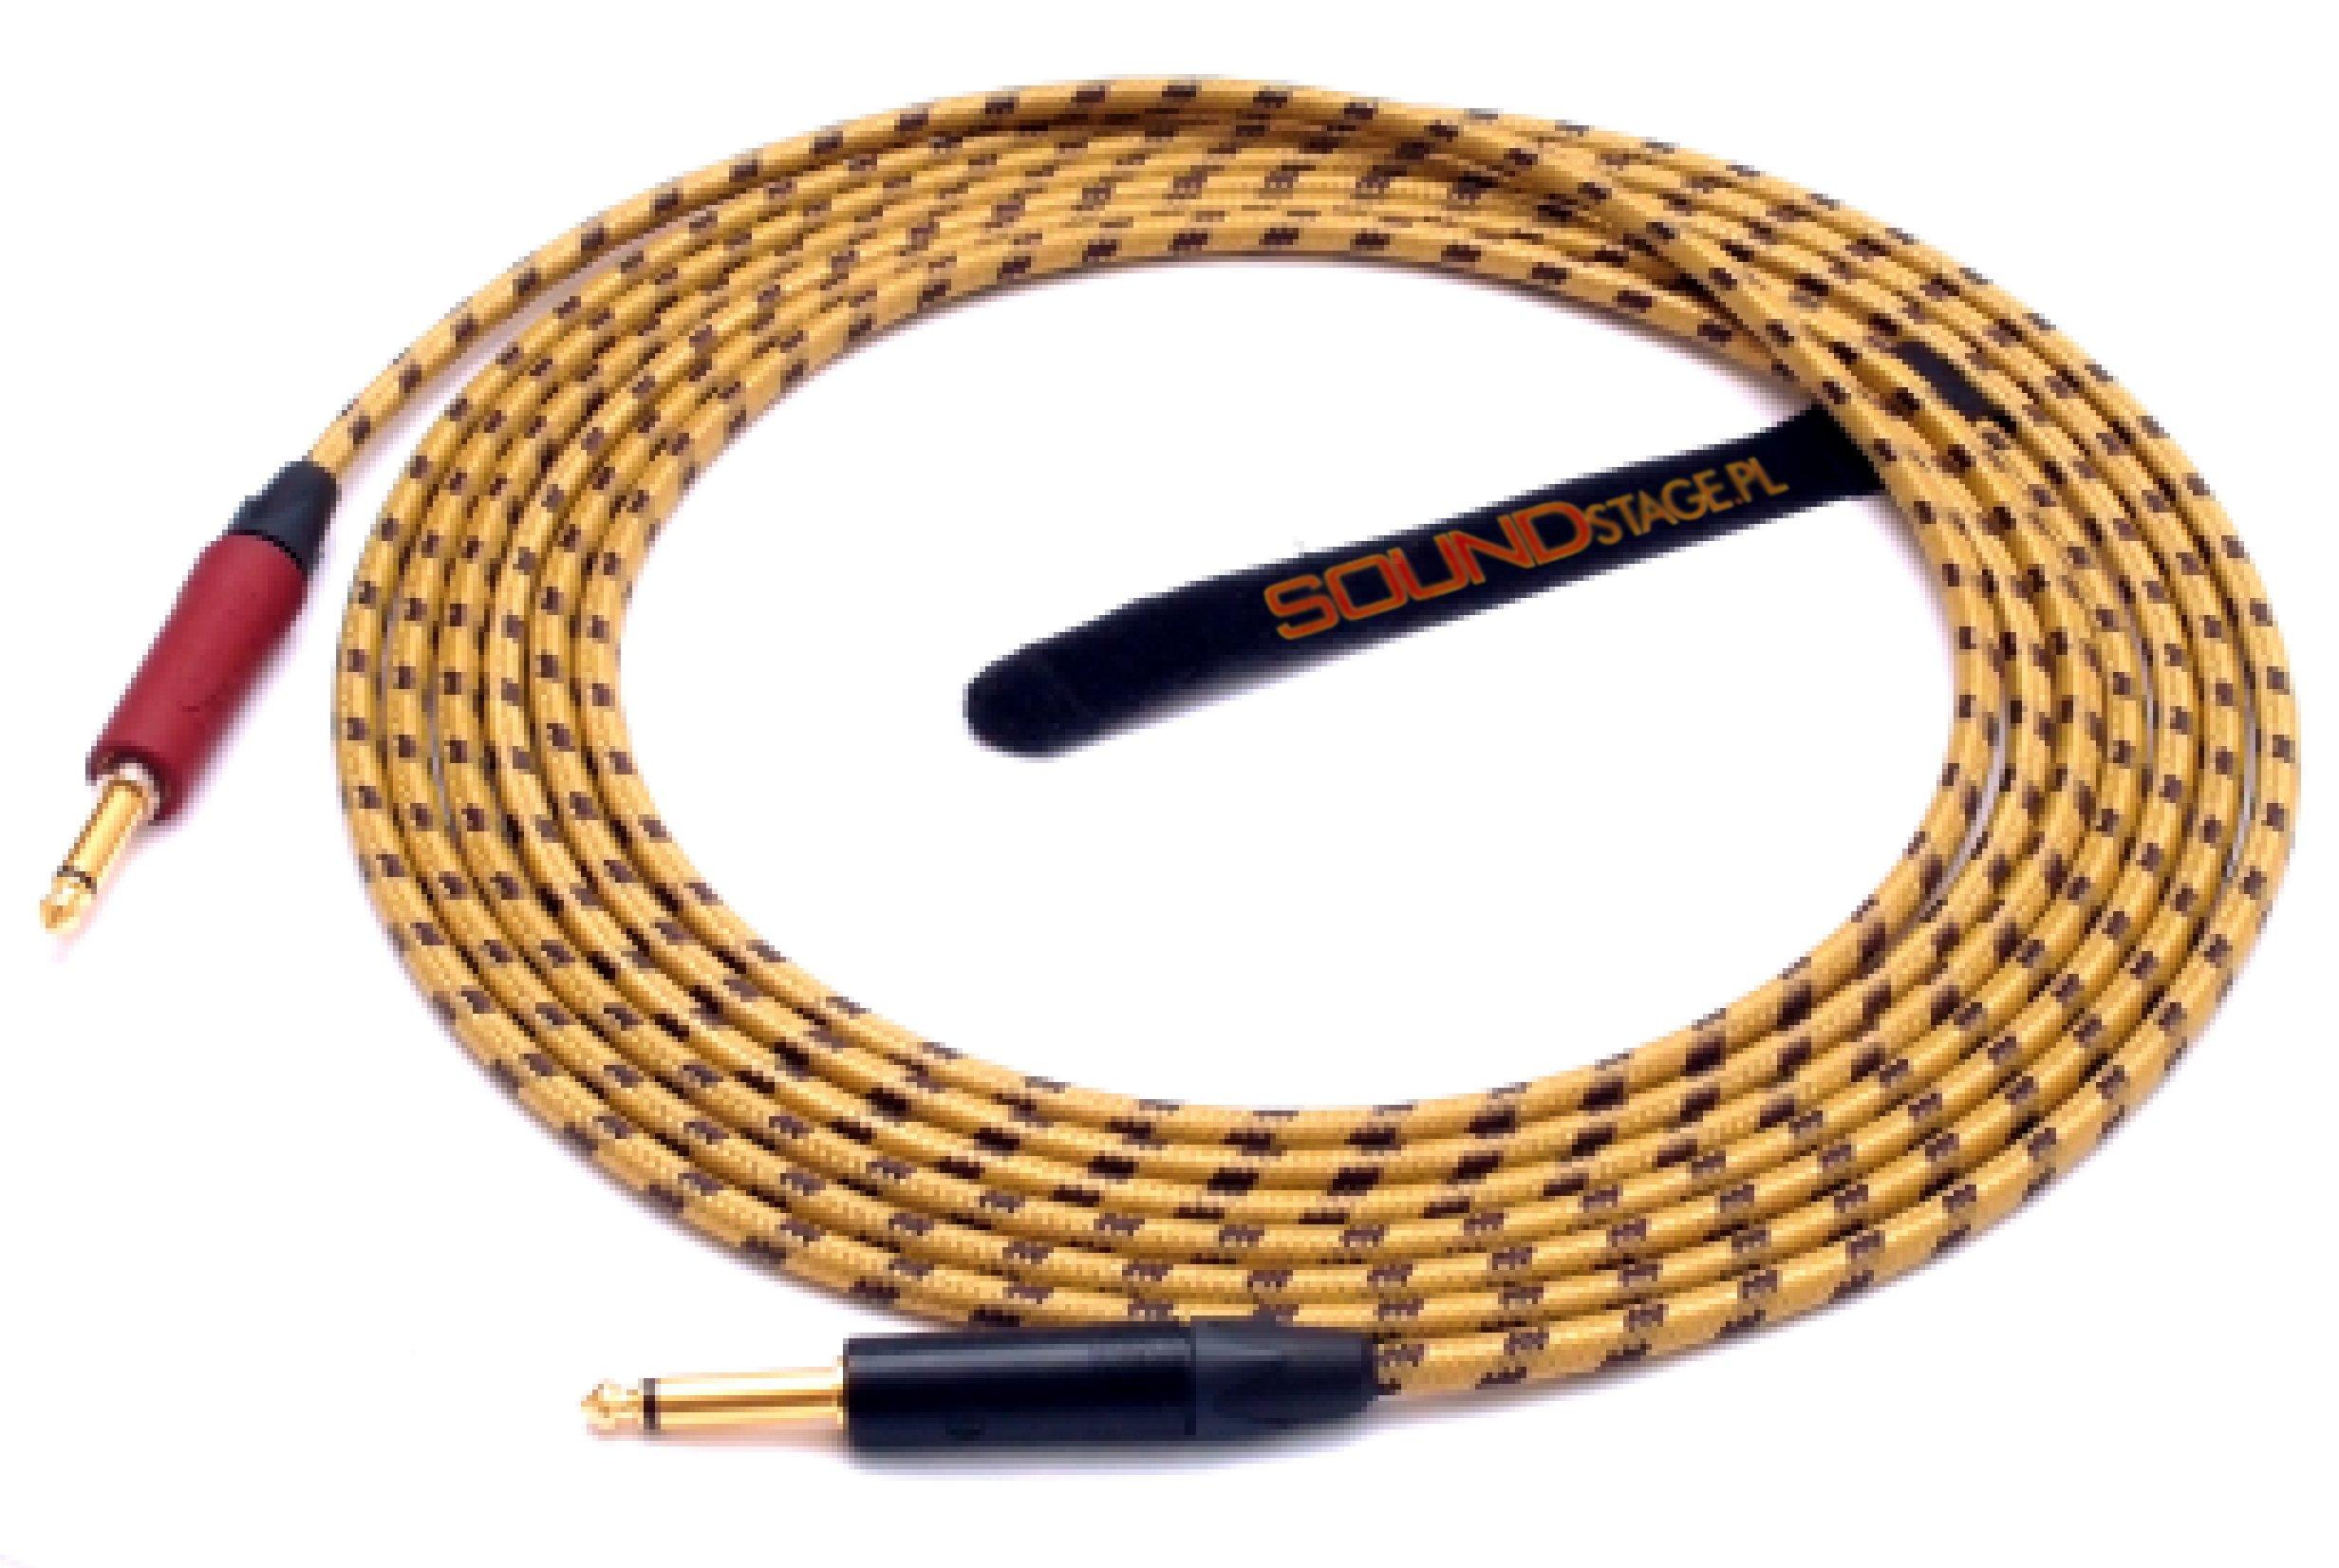 5M GITARA kábel Tichý NEUTRIK/SOMMER vintage